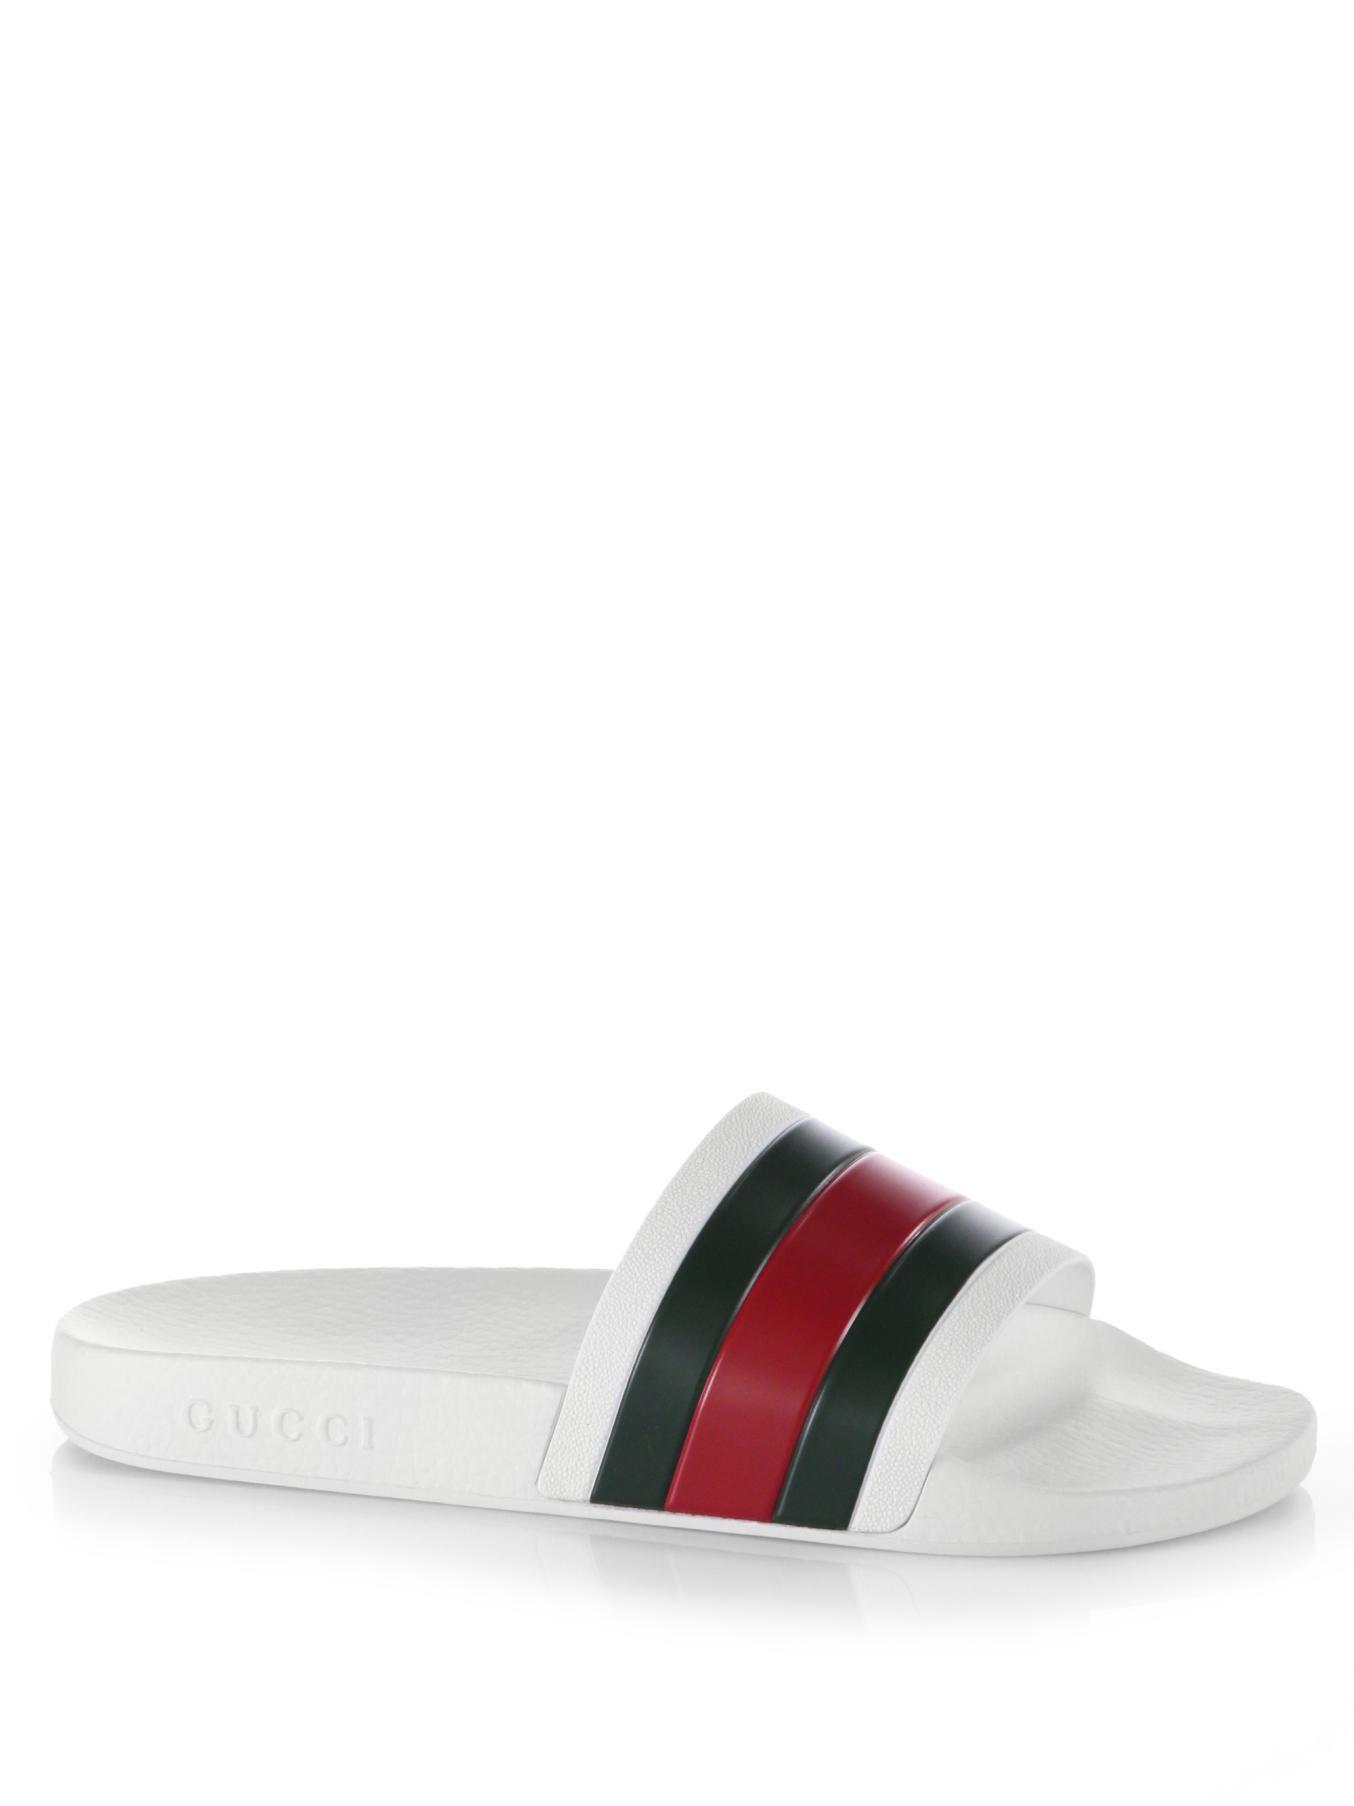 310ba2dd89fa9 Gucci Slides On Sales. Gucci Pursuit 72 Rubber Slides in White for Men